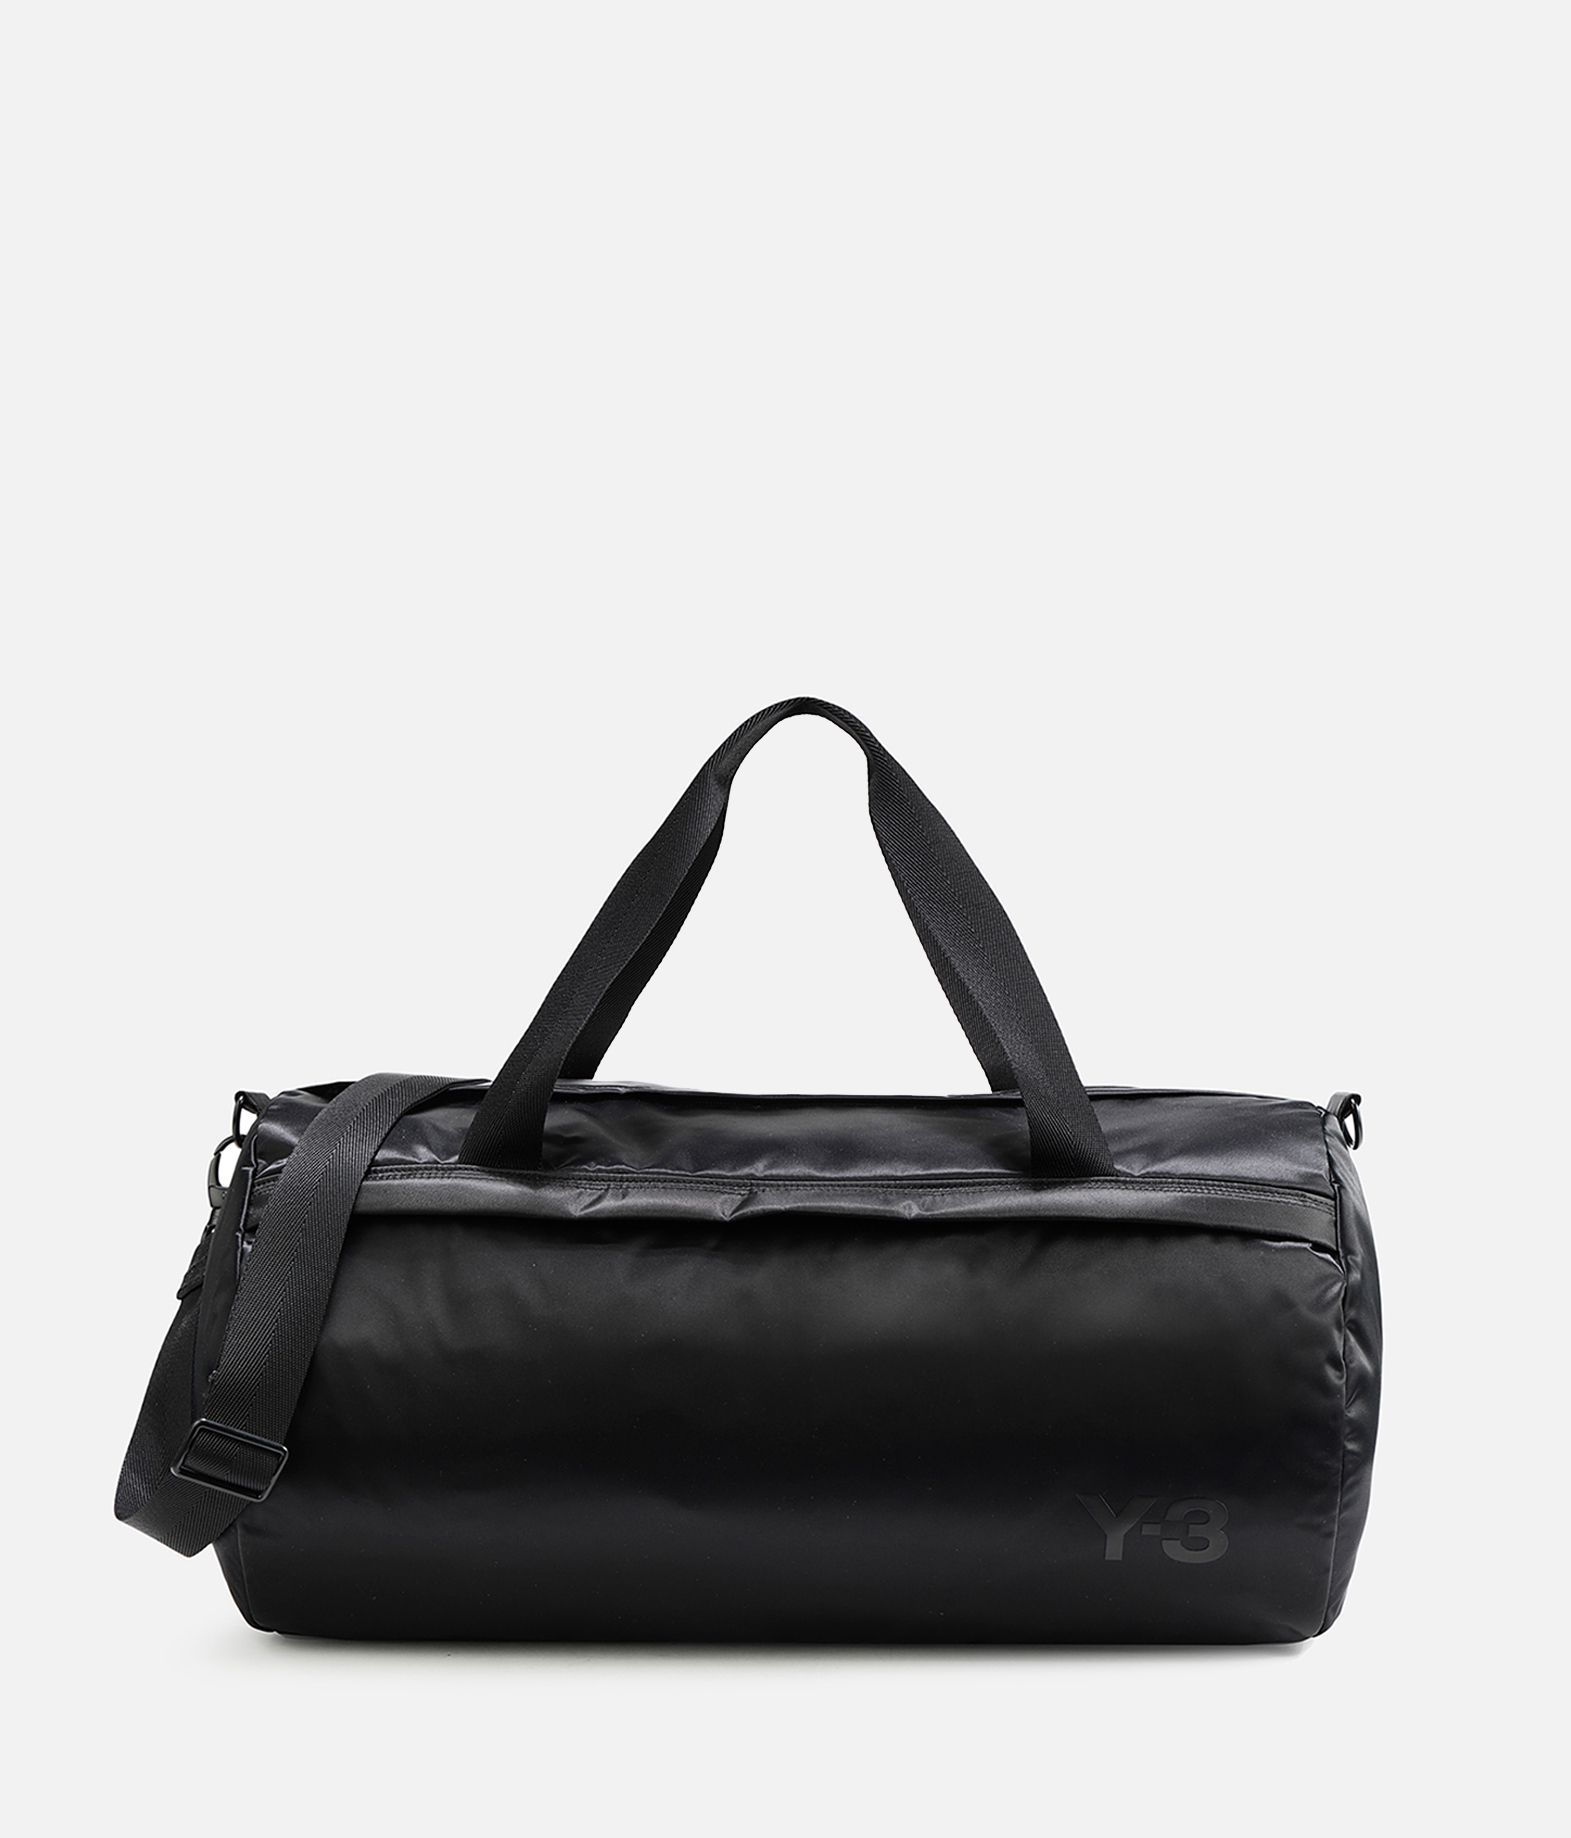 Y-3 Y-3 Gym Bag Gym bag E f